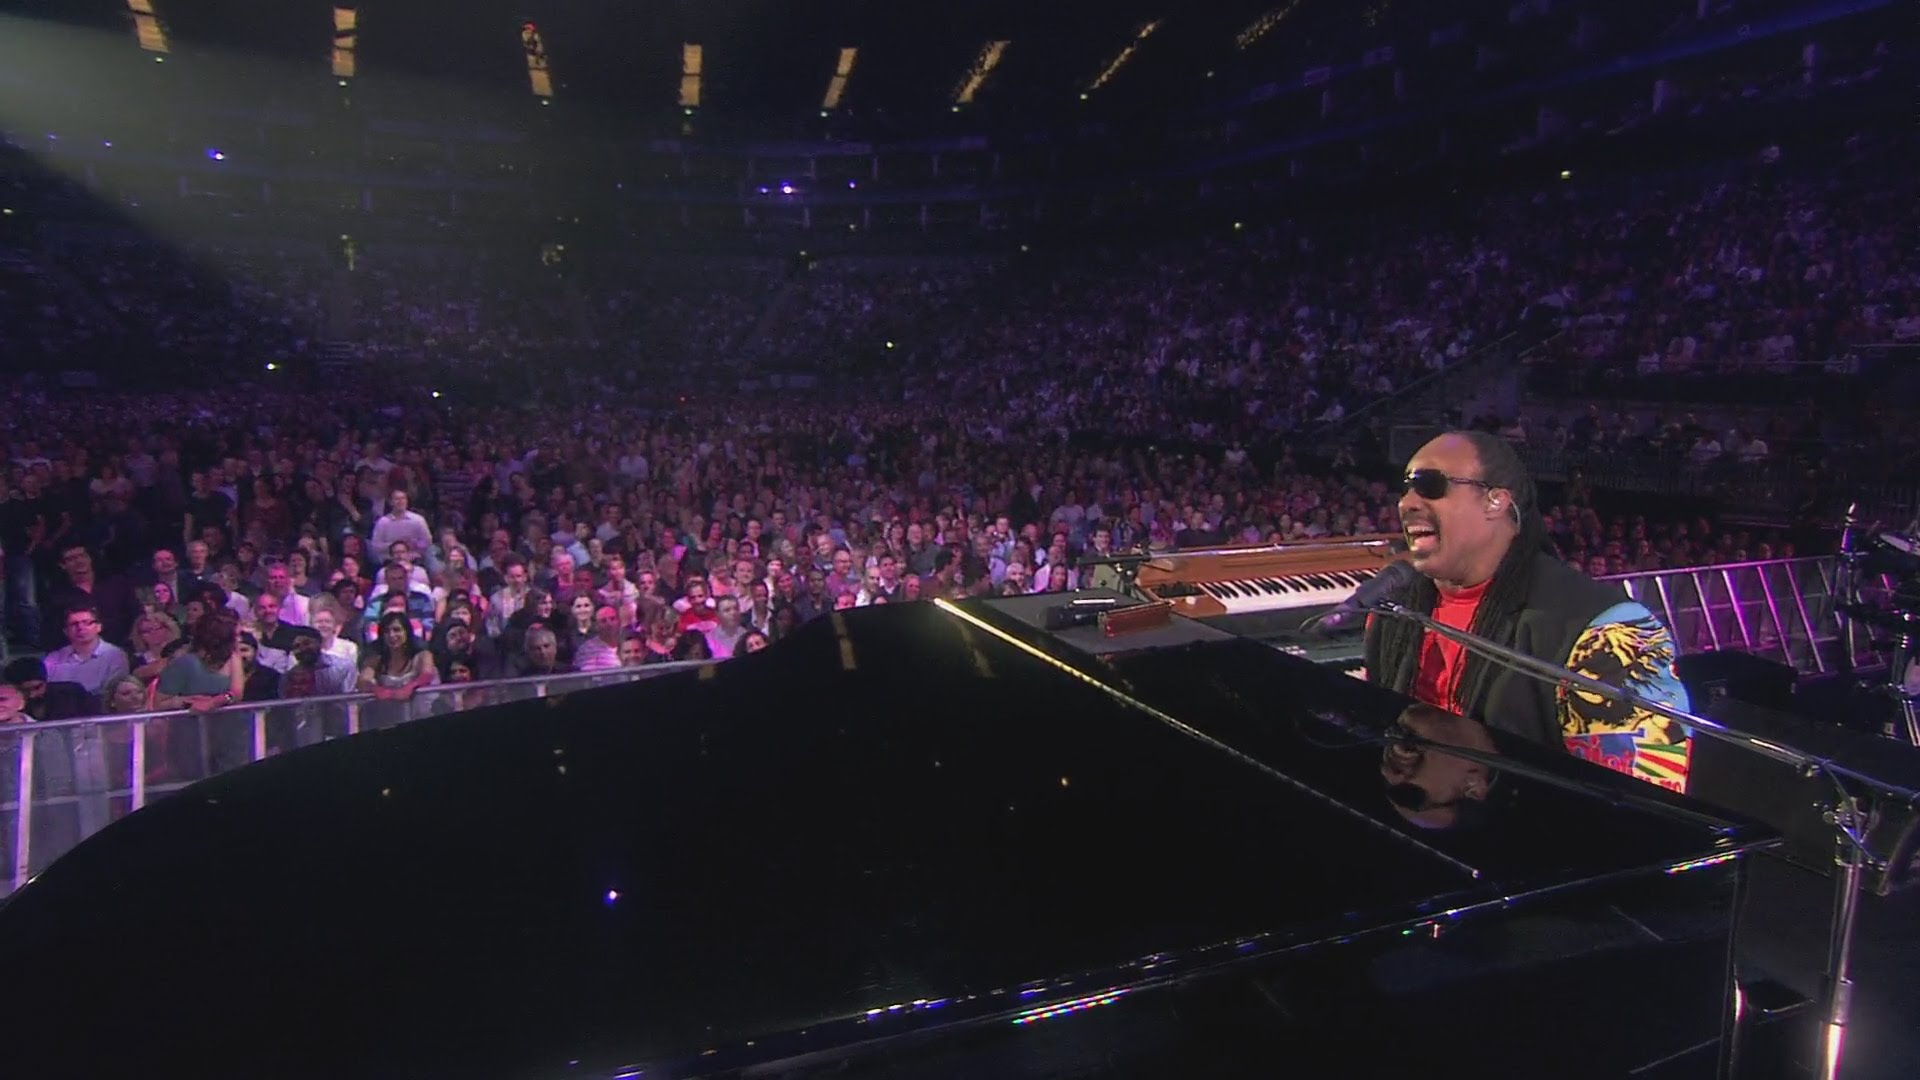 """Wonder Blunder"" Promoter Sentenced 5 Years Over 2012 Stevie Wonder Concert That Never Happened"